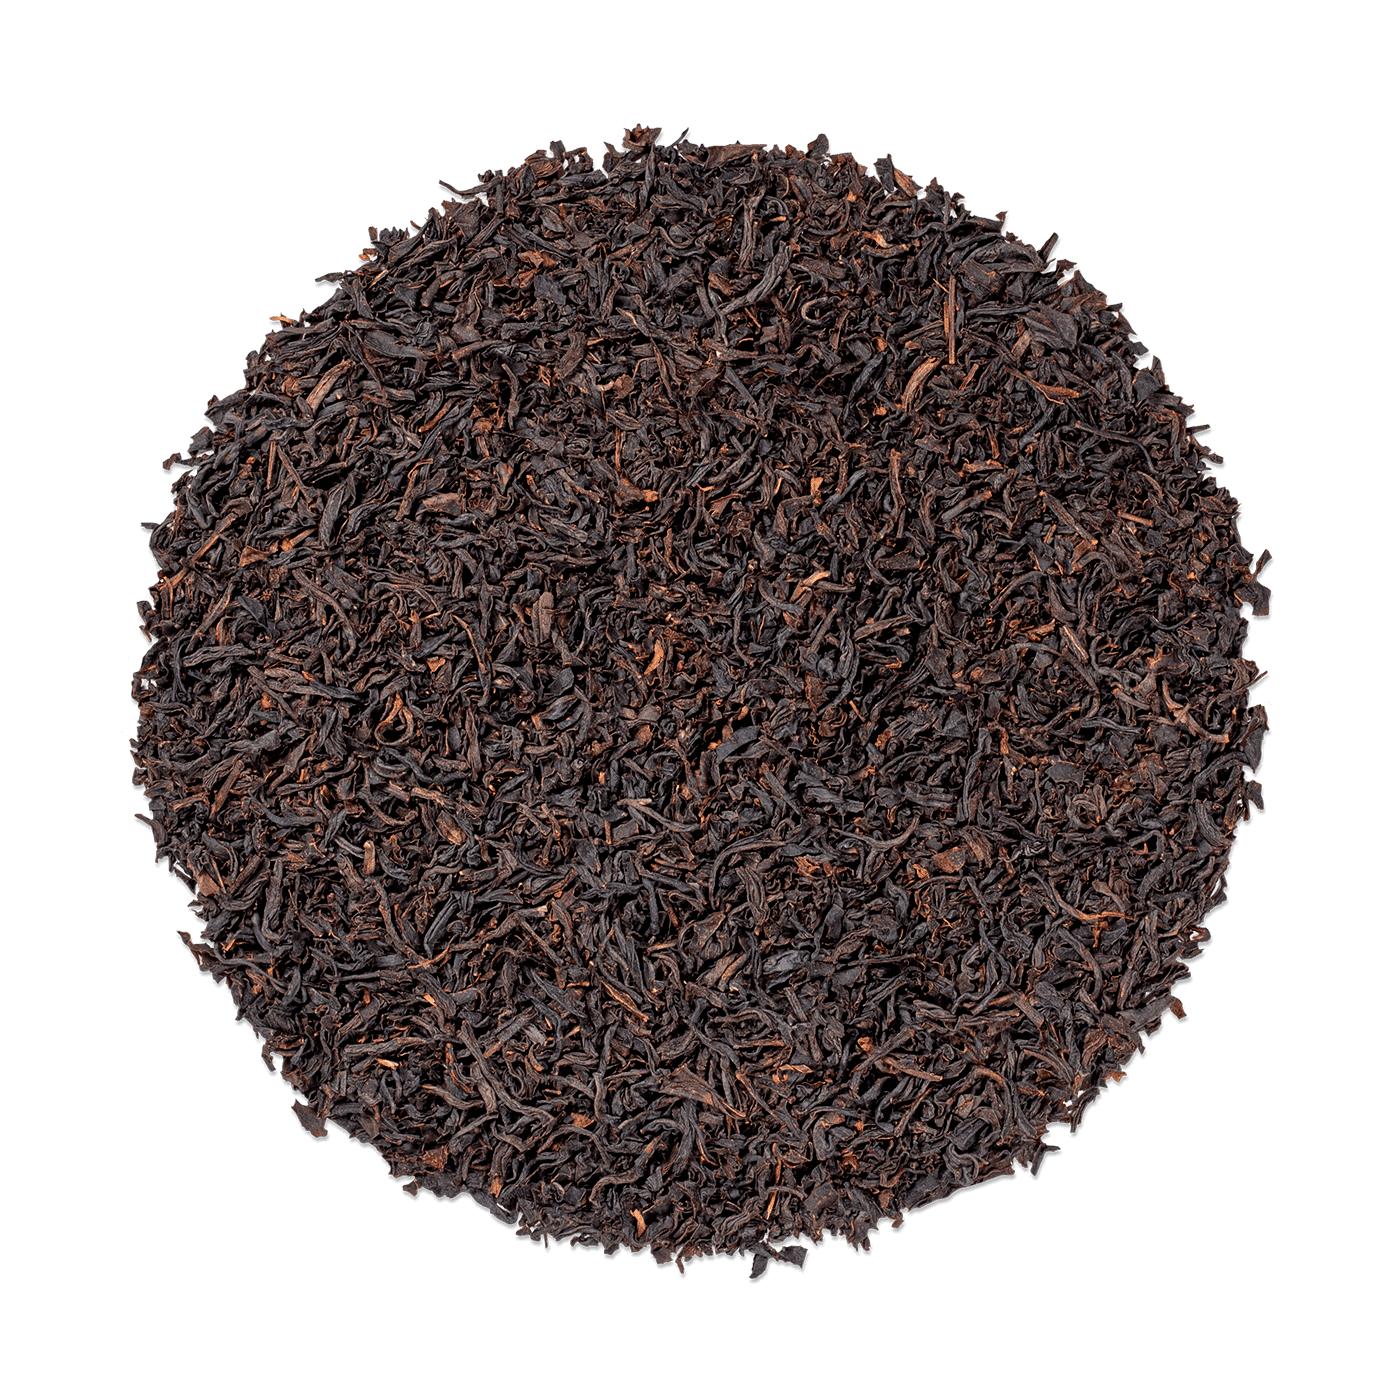 KUSMI TEA Earl Grey goût polonais N°18 bio - Thé noir, bergamote, citron - Kusmi Tea